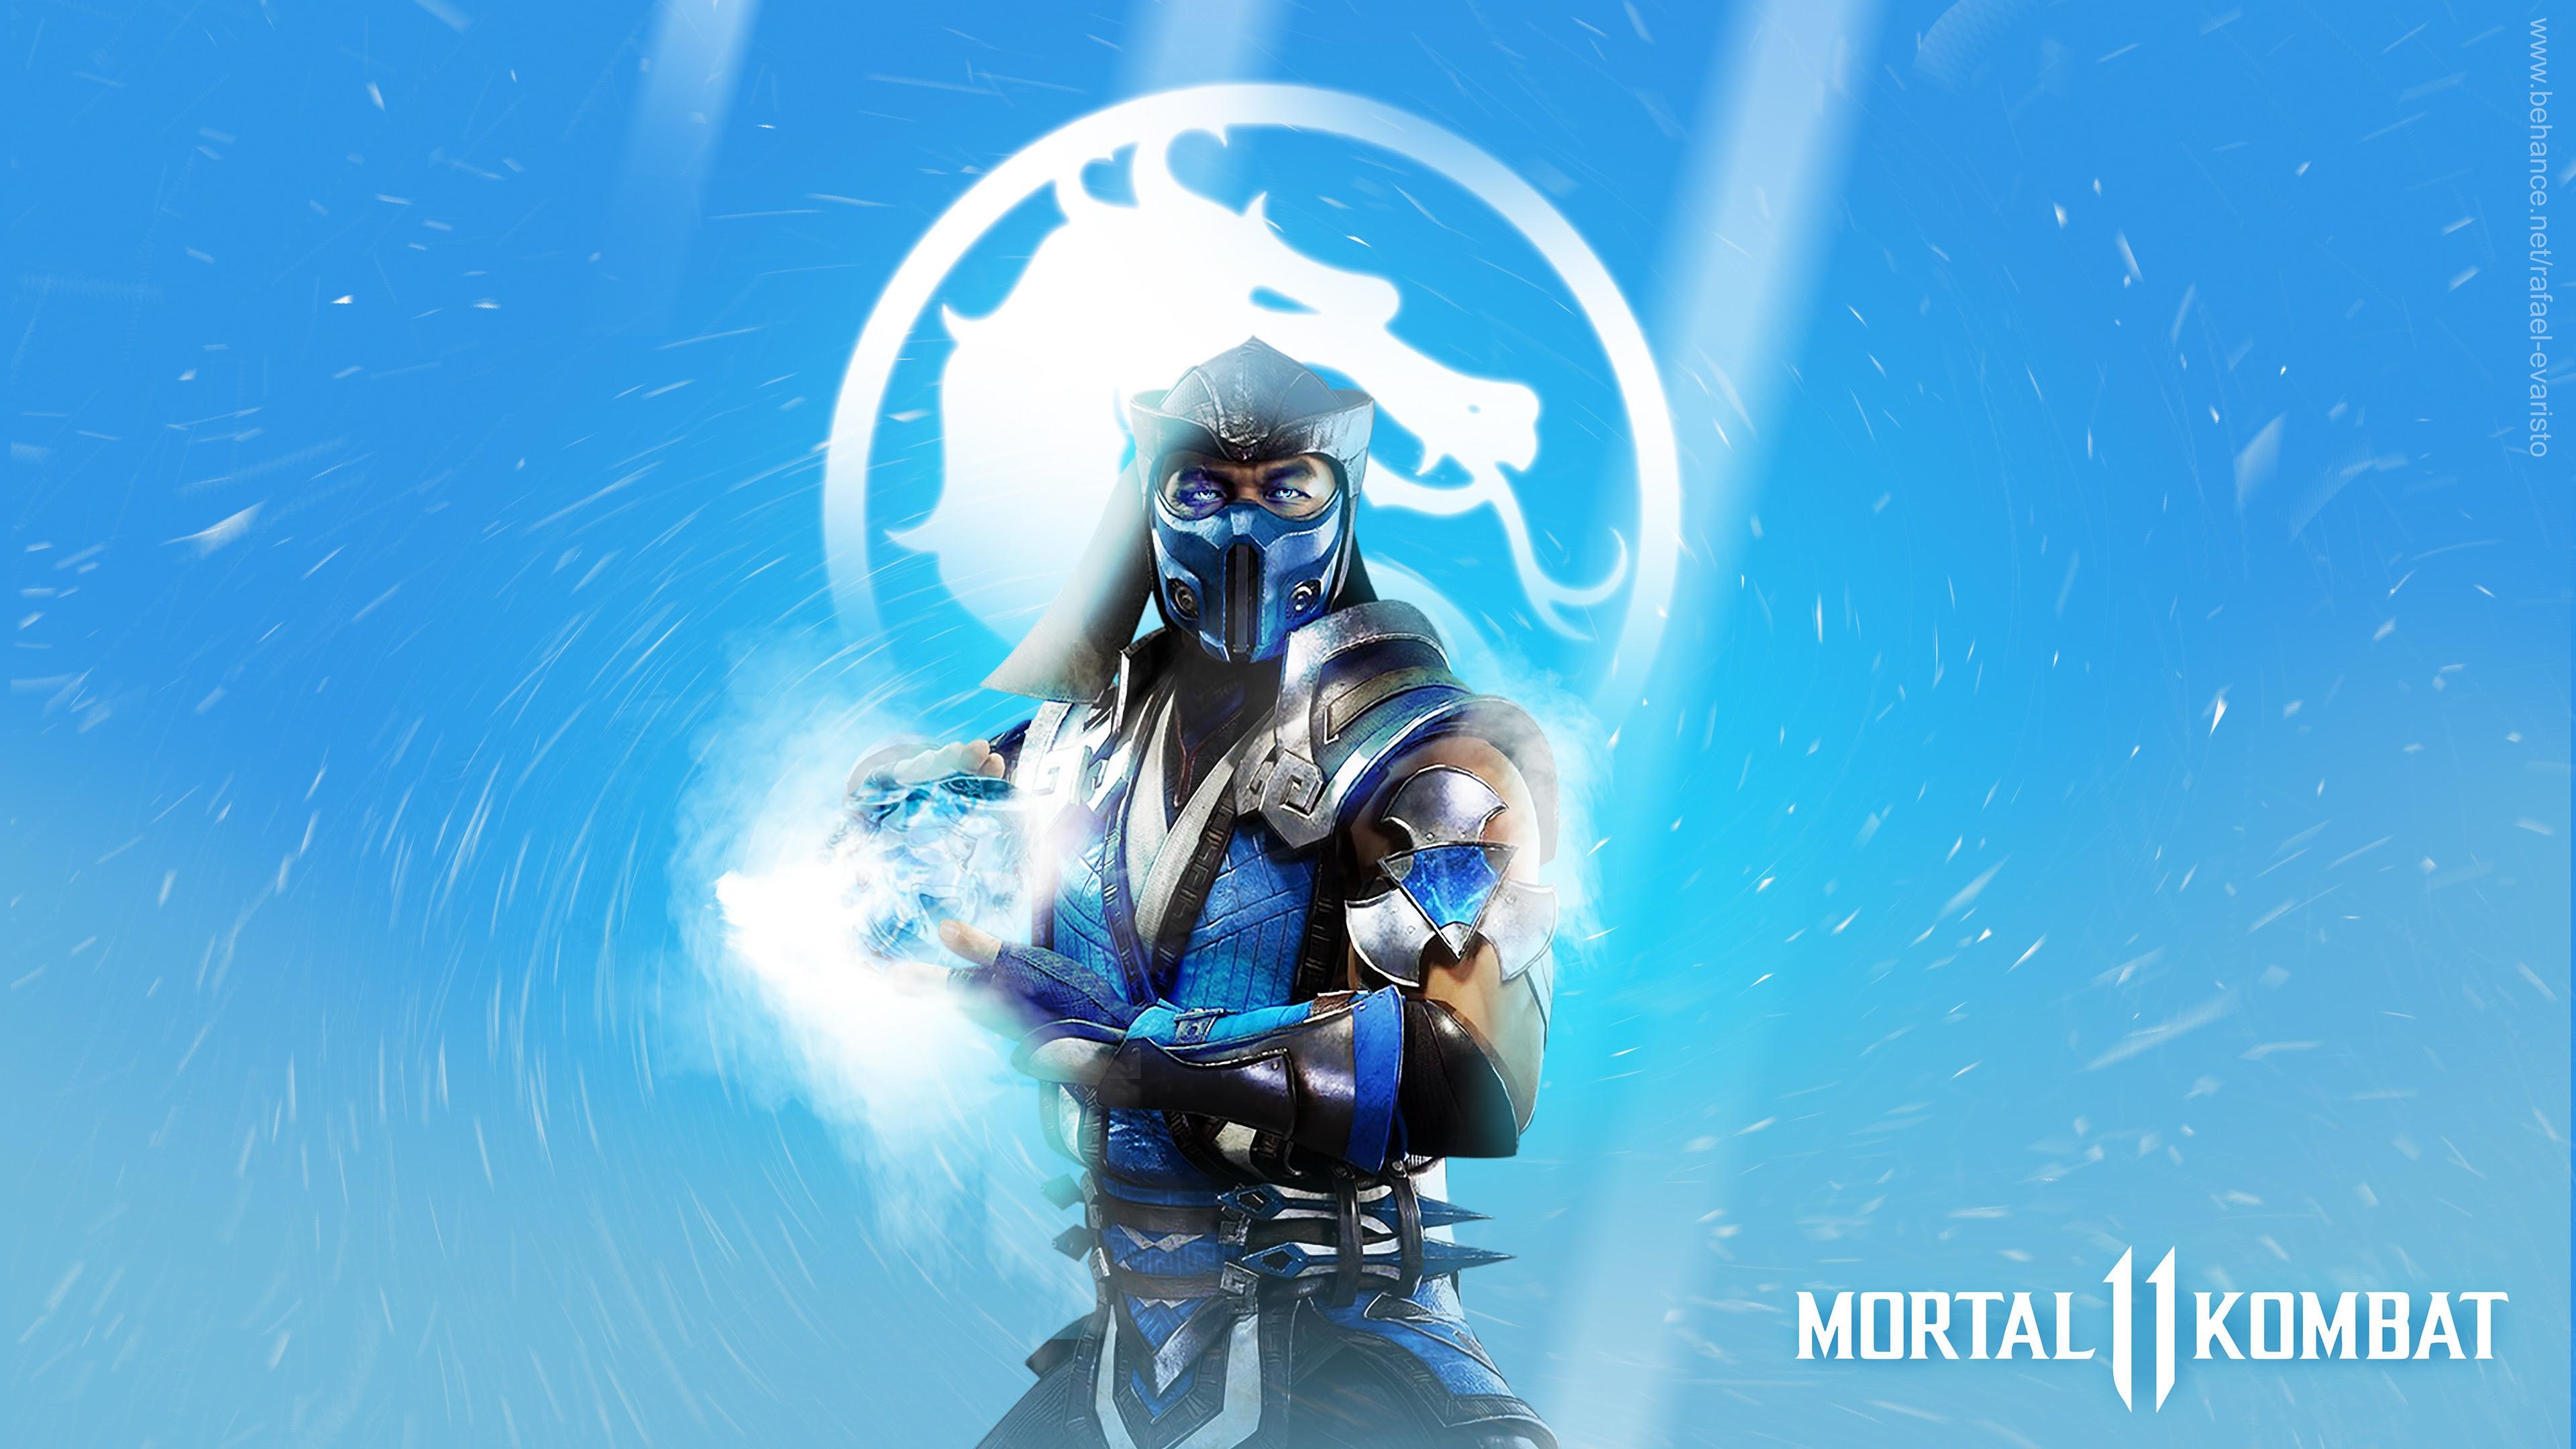 Sub Zero In Mortal Kombat 11 4k Wallpapers Hd Wallpapers